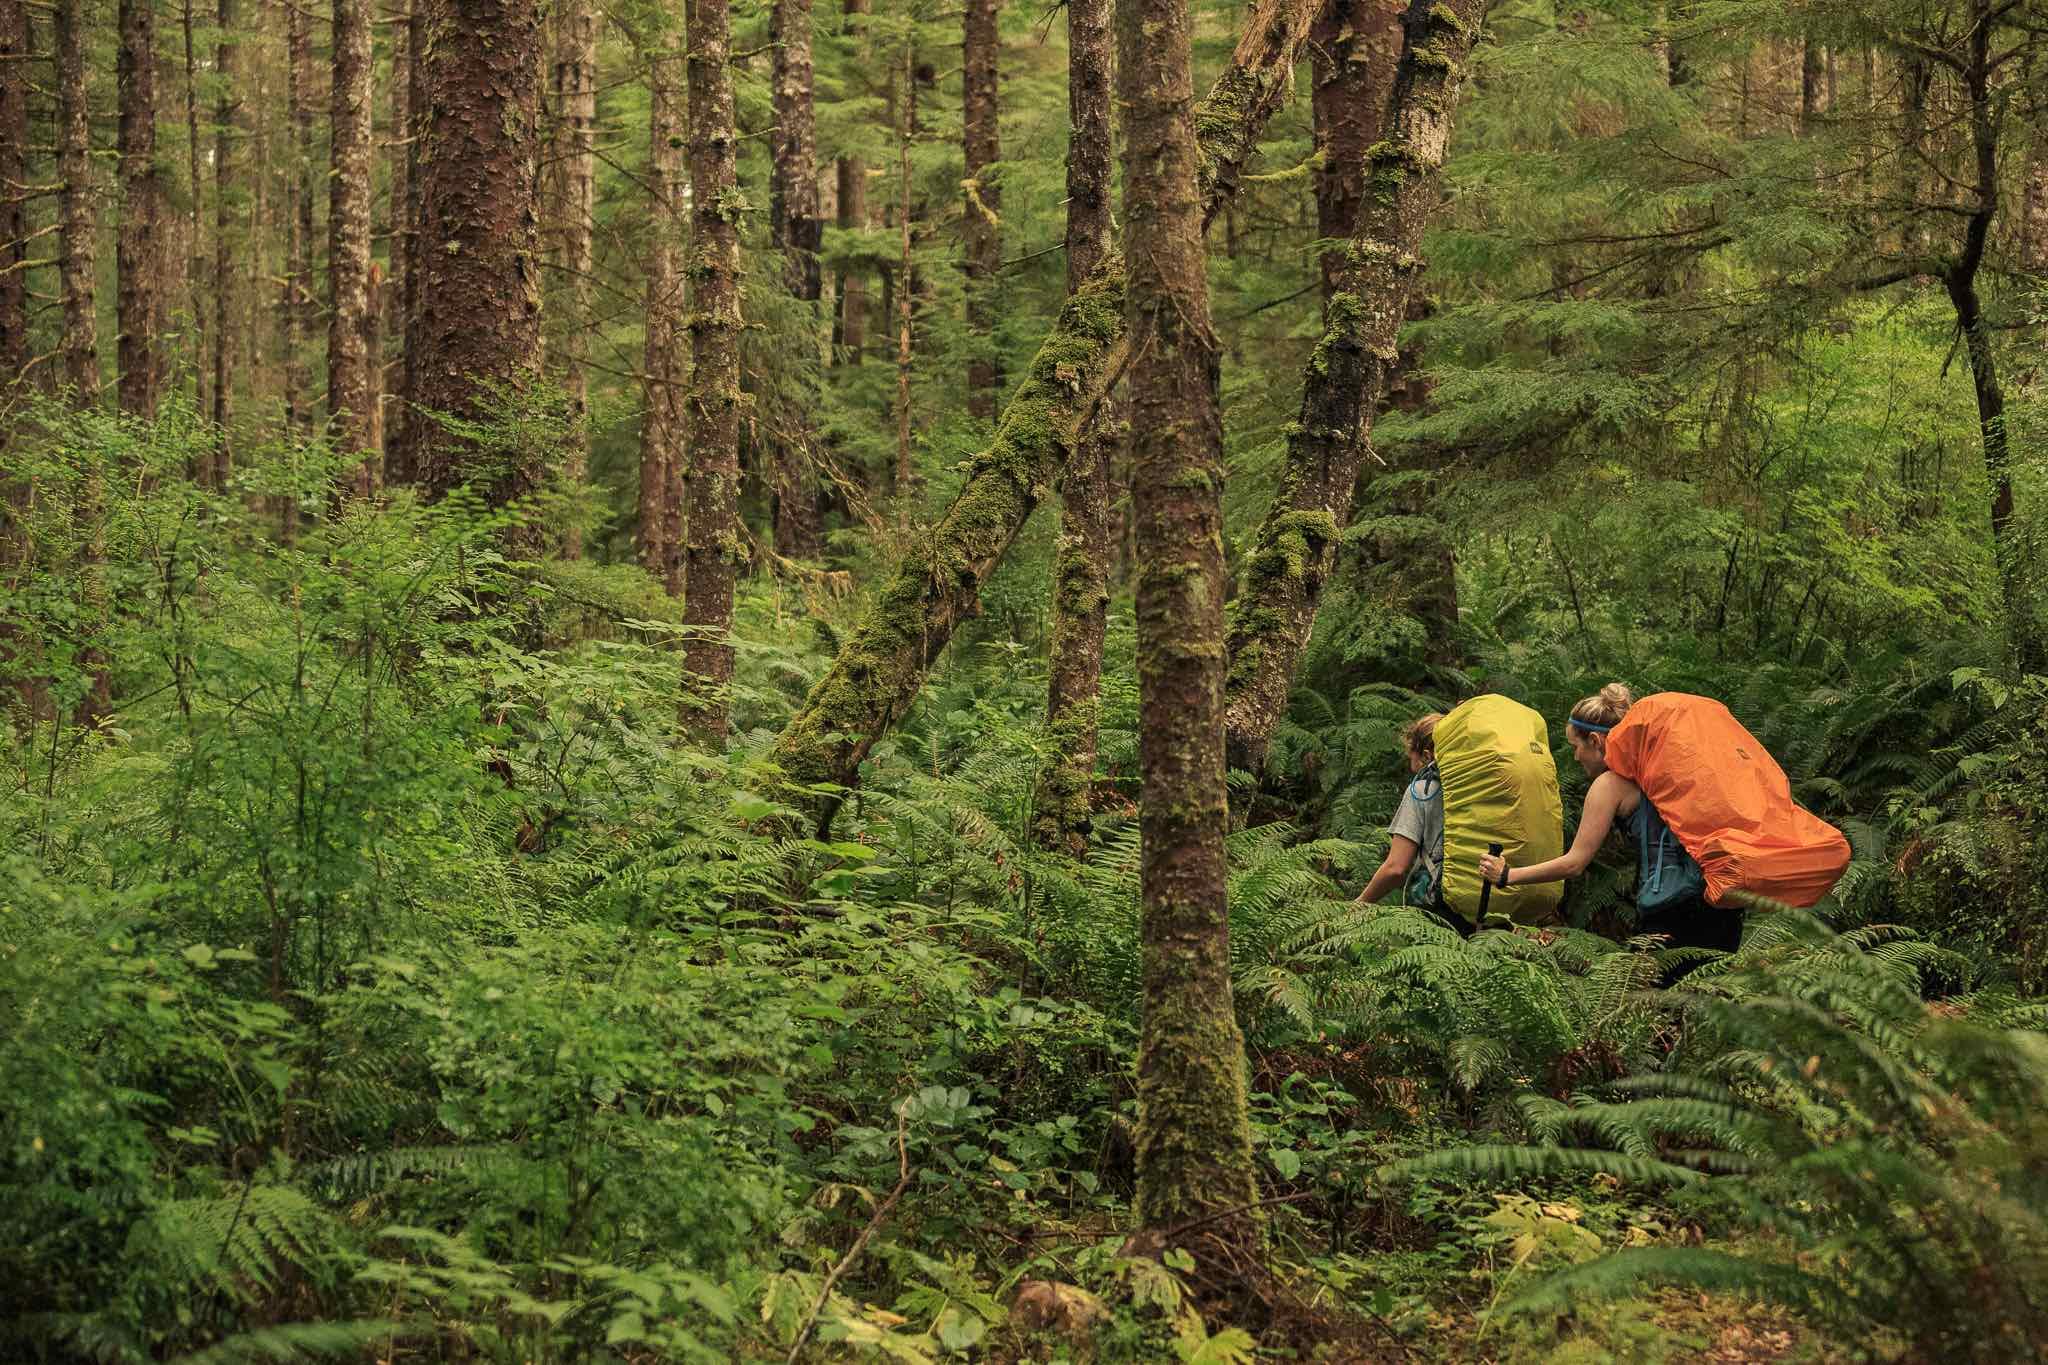 BECOME A TREE HUGGER